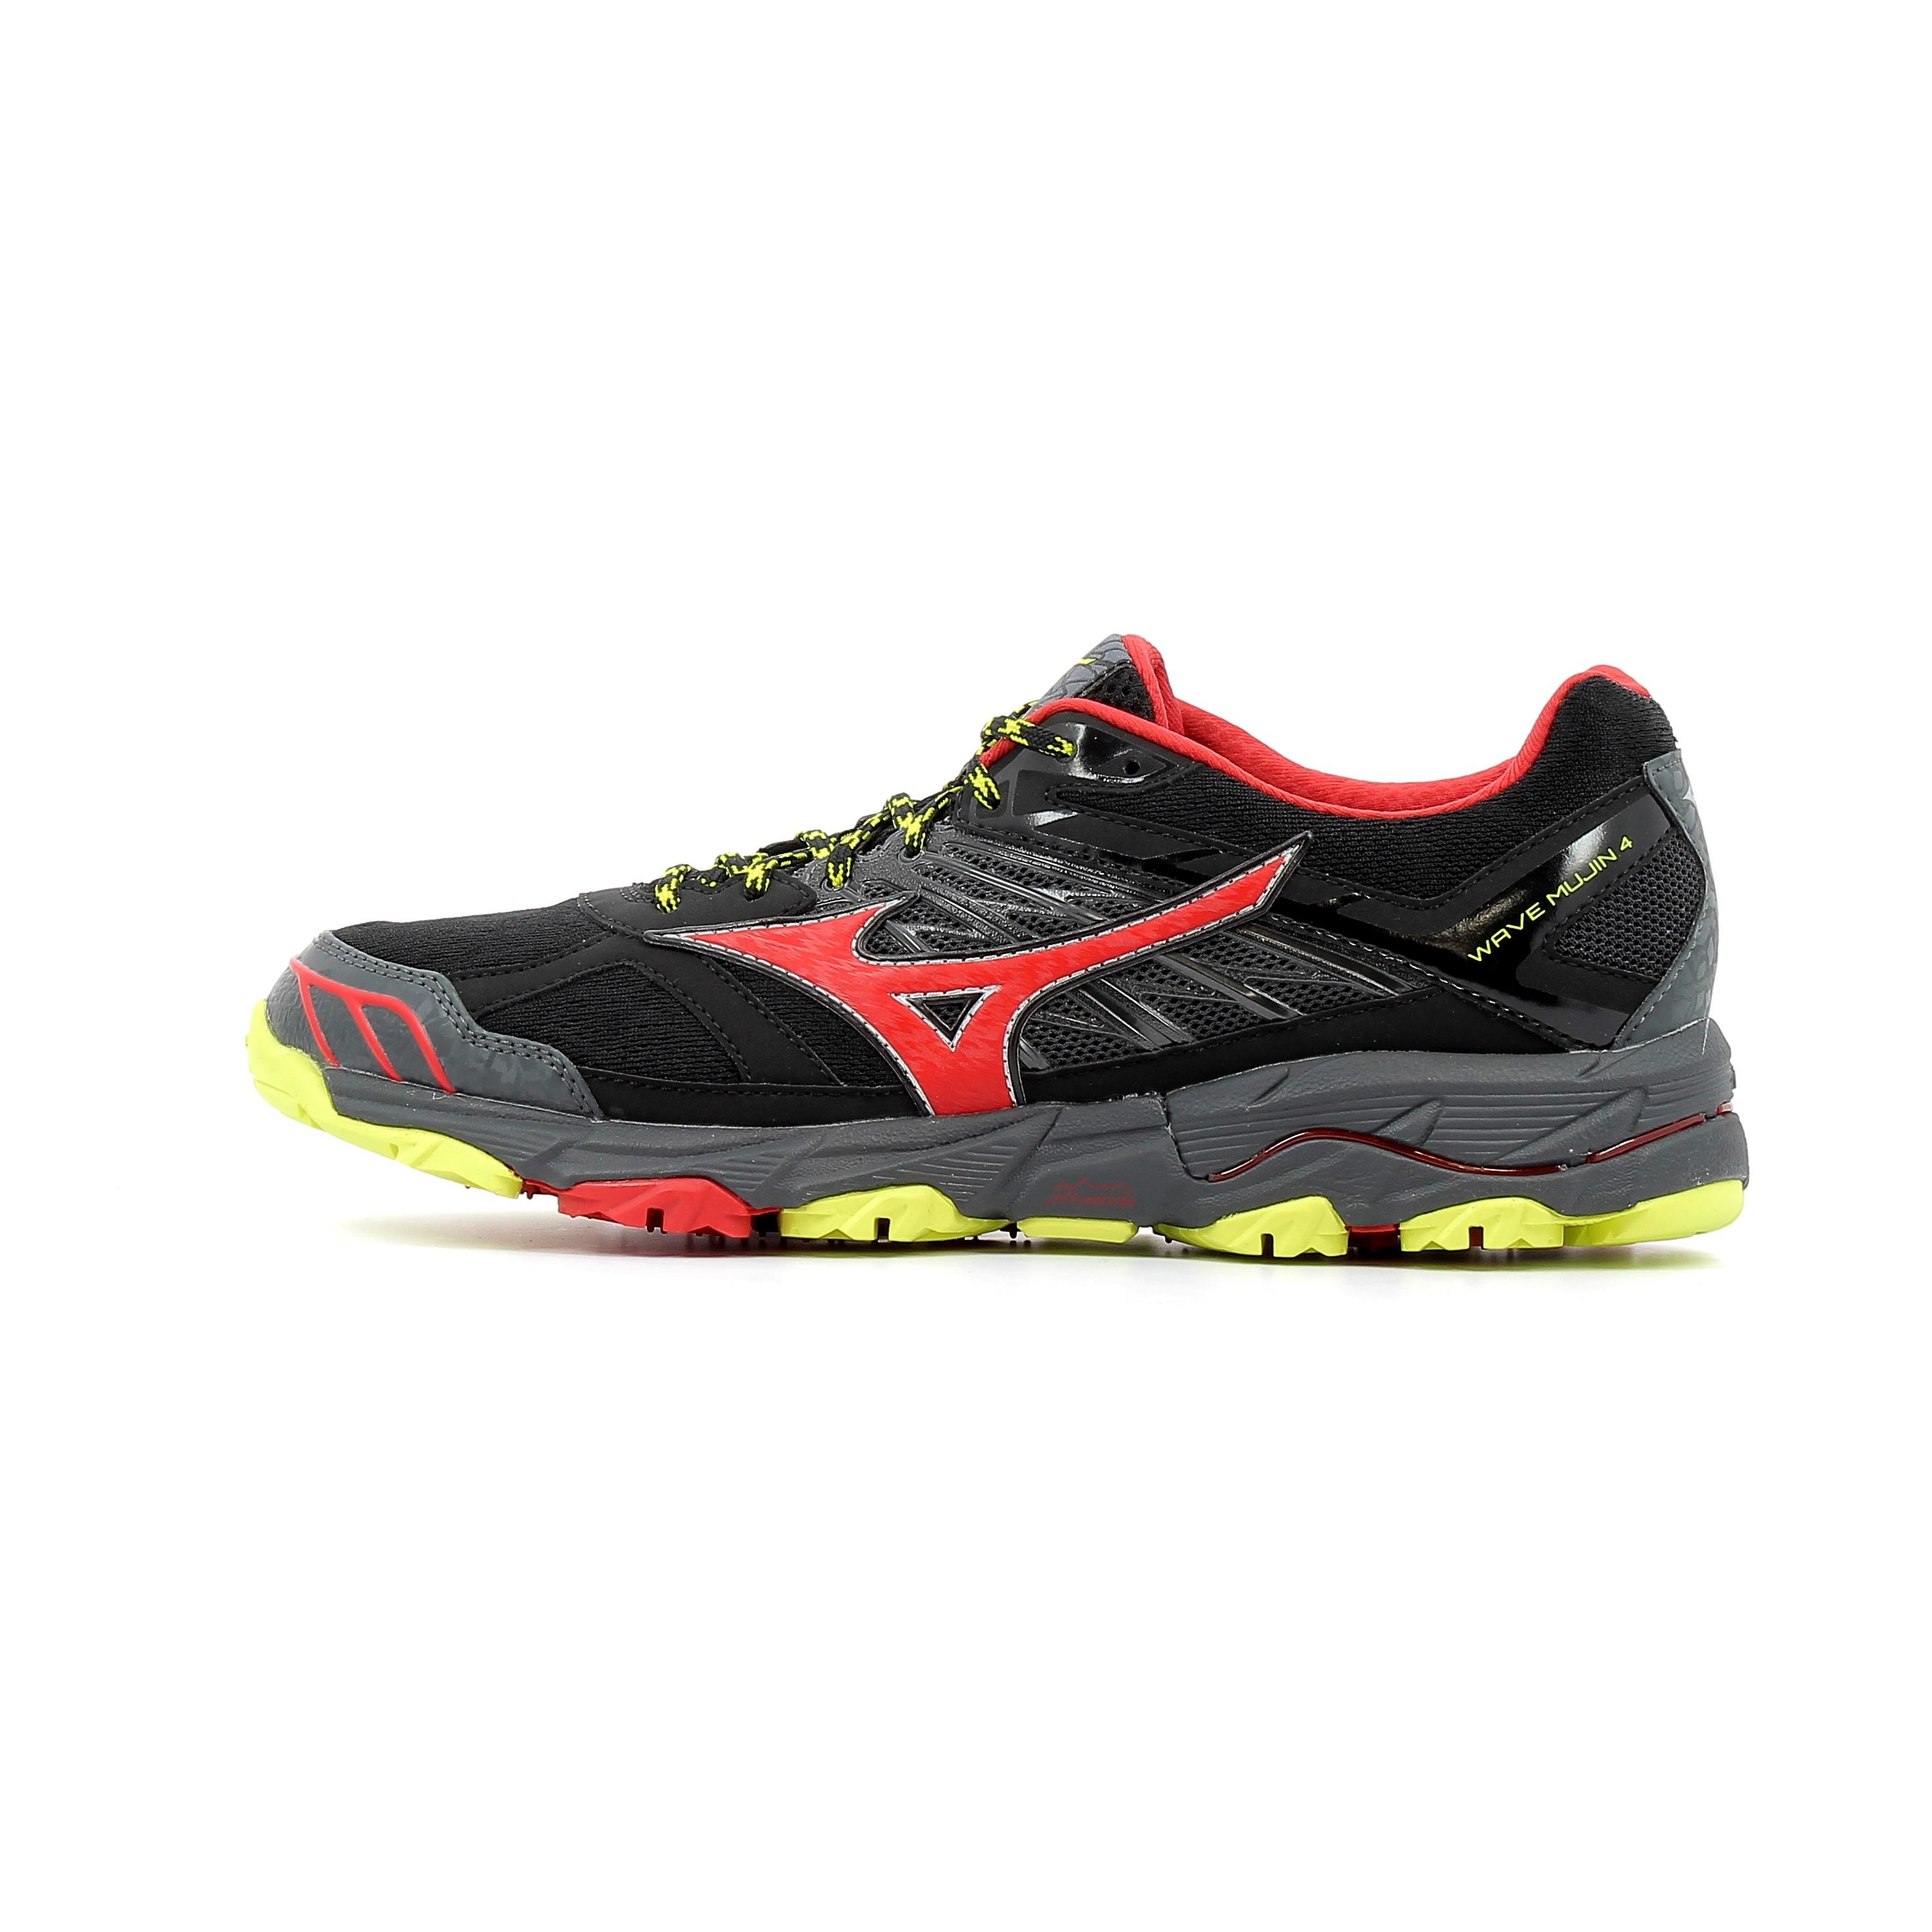 huge selection of b919b e2bf9 Chaussures de trail Mizuno Wave Mujin 4 Homme